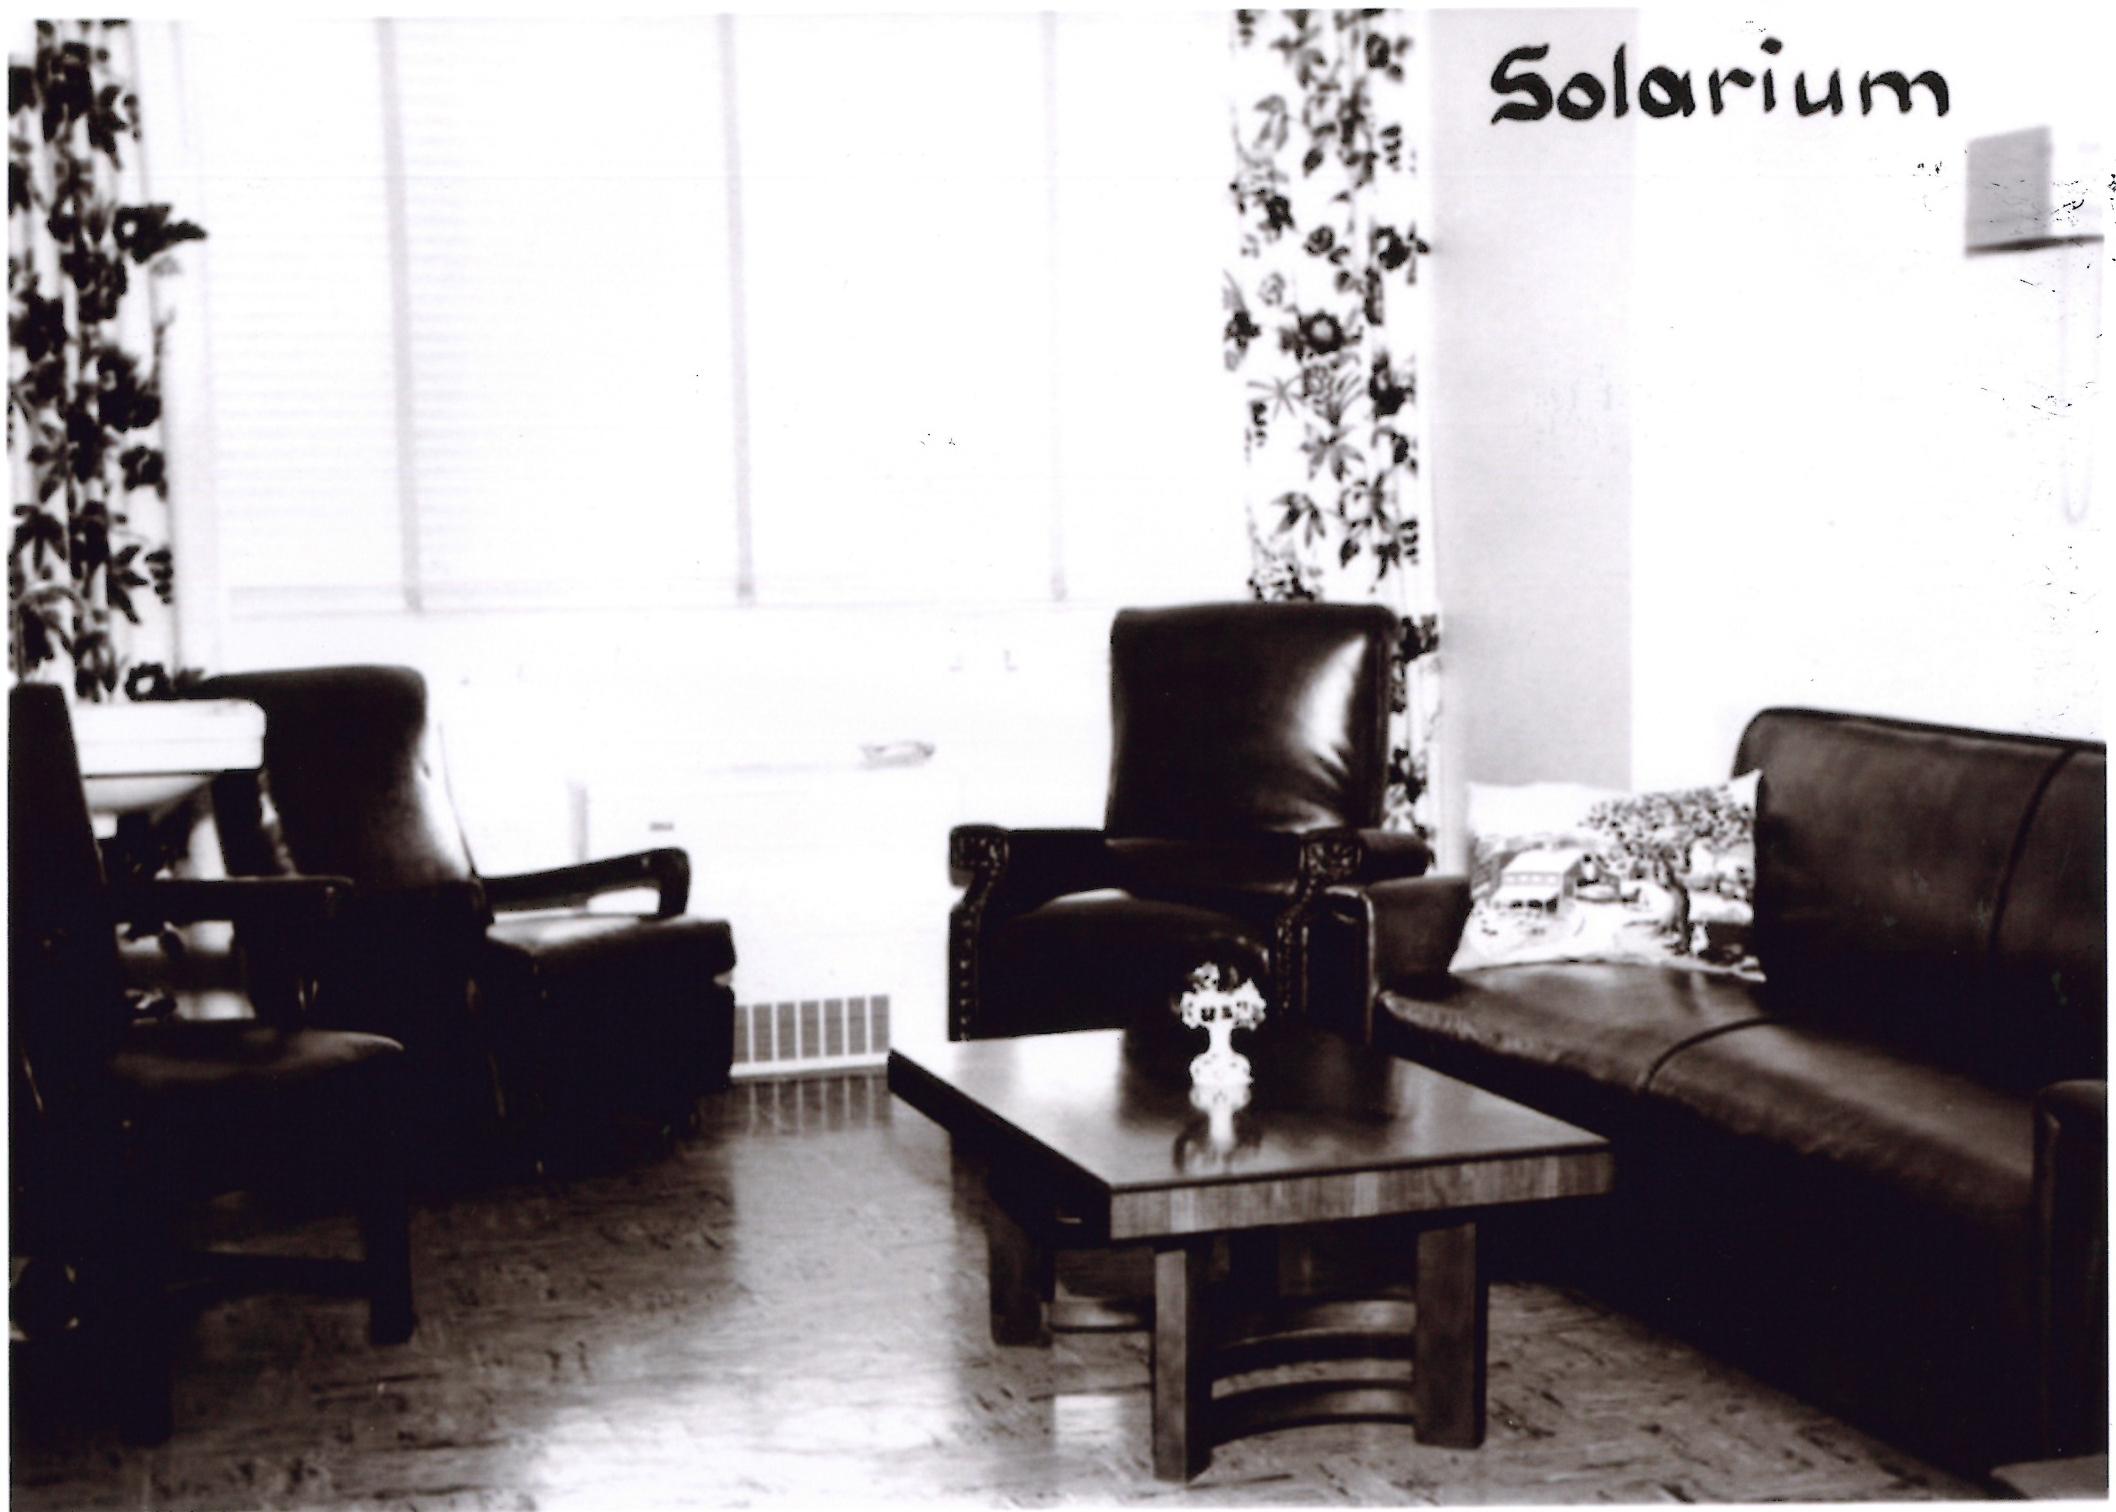 StMartins_Solarium.jpg